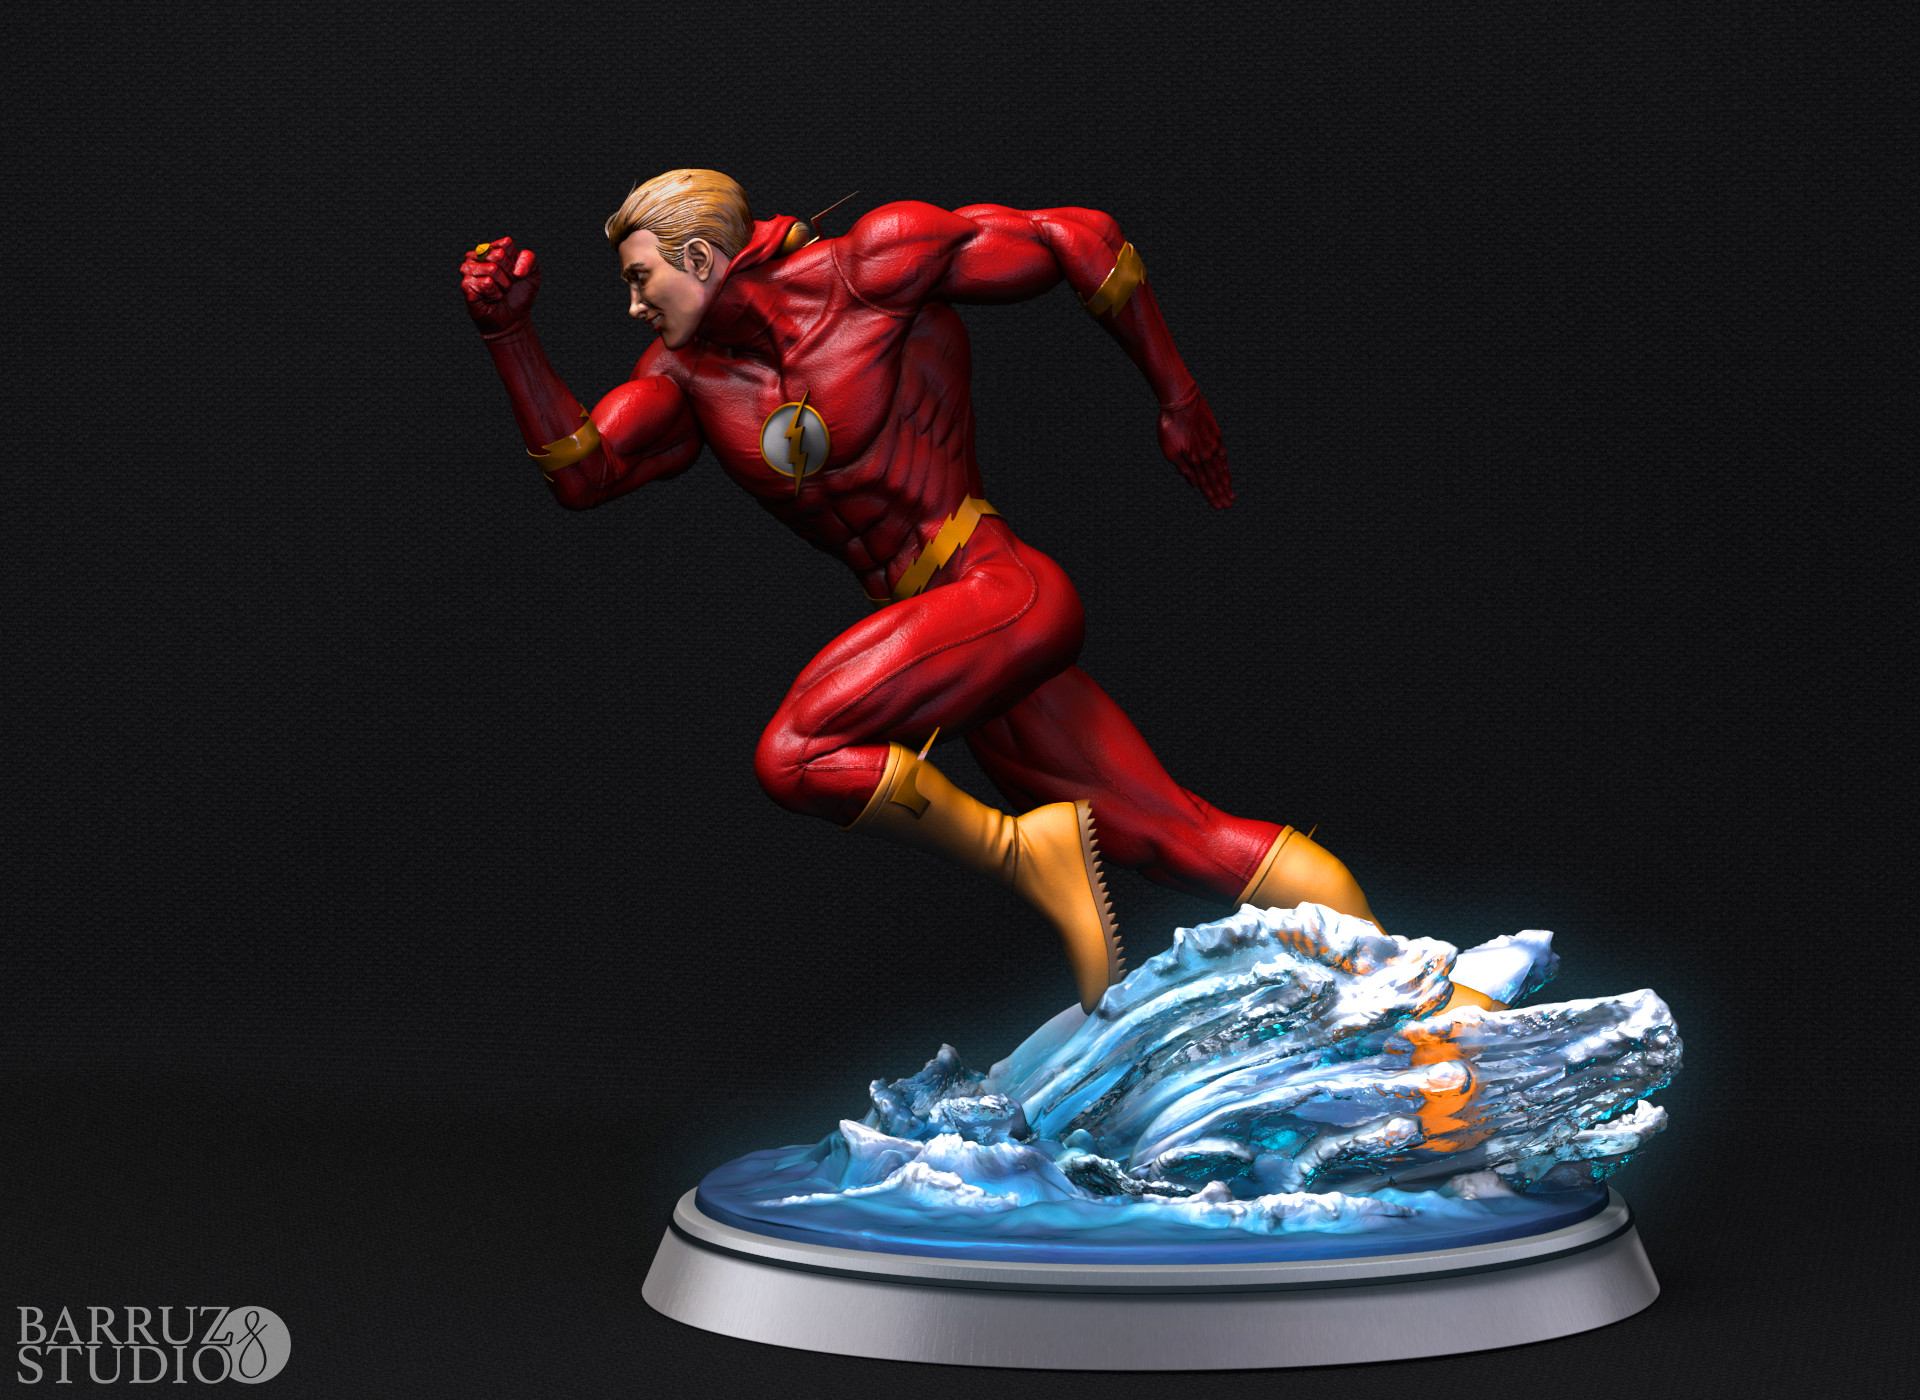 David fernandez barruz 0004 flash overwater 05